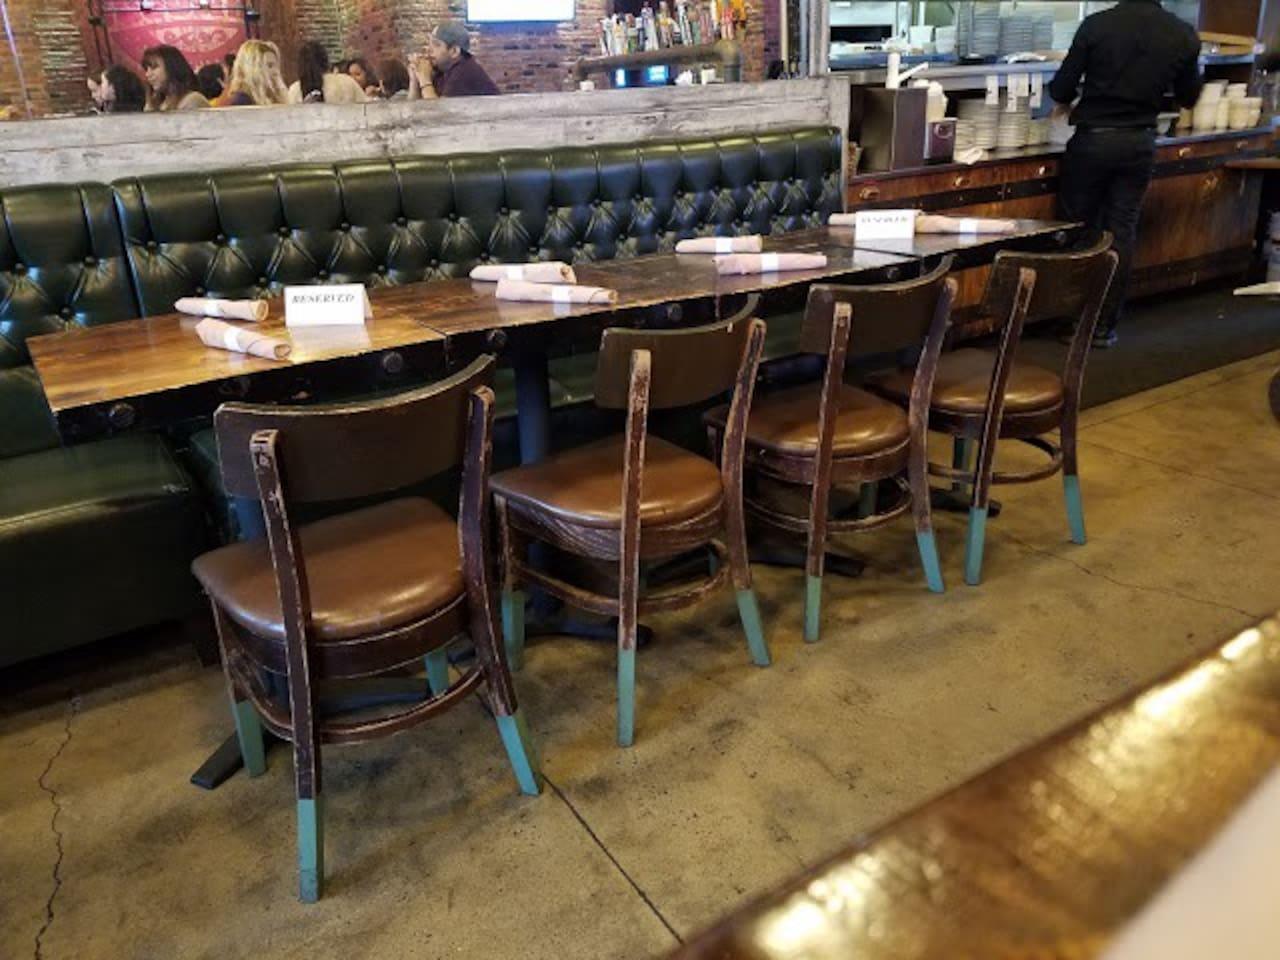 Inwood Bar and Grill, Restaurant restaurant in Manhattan - Airbnb